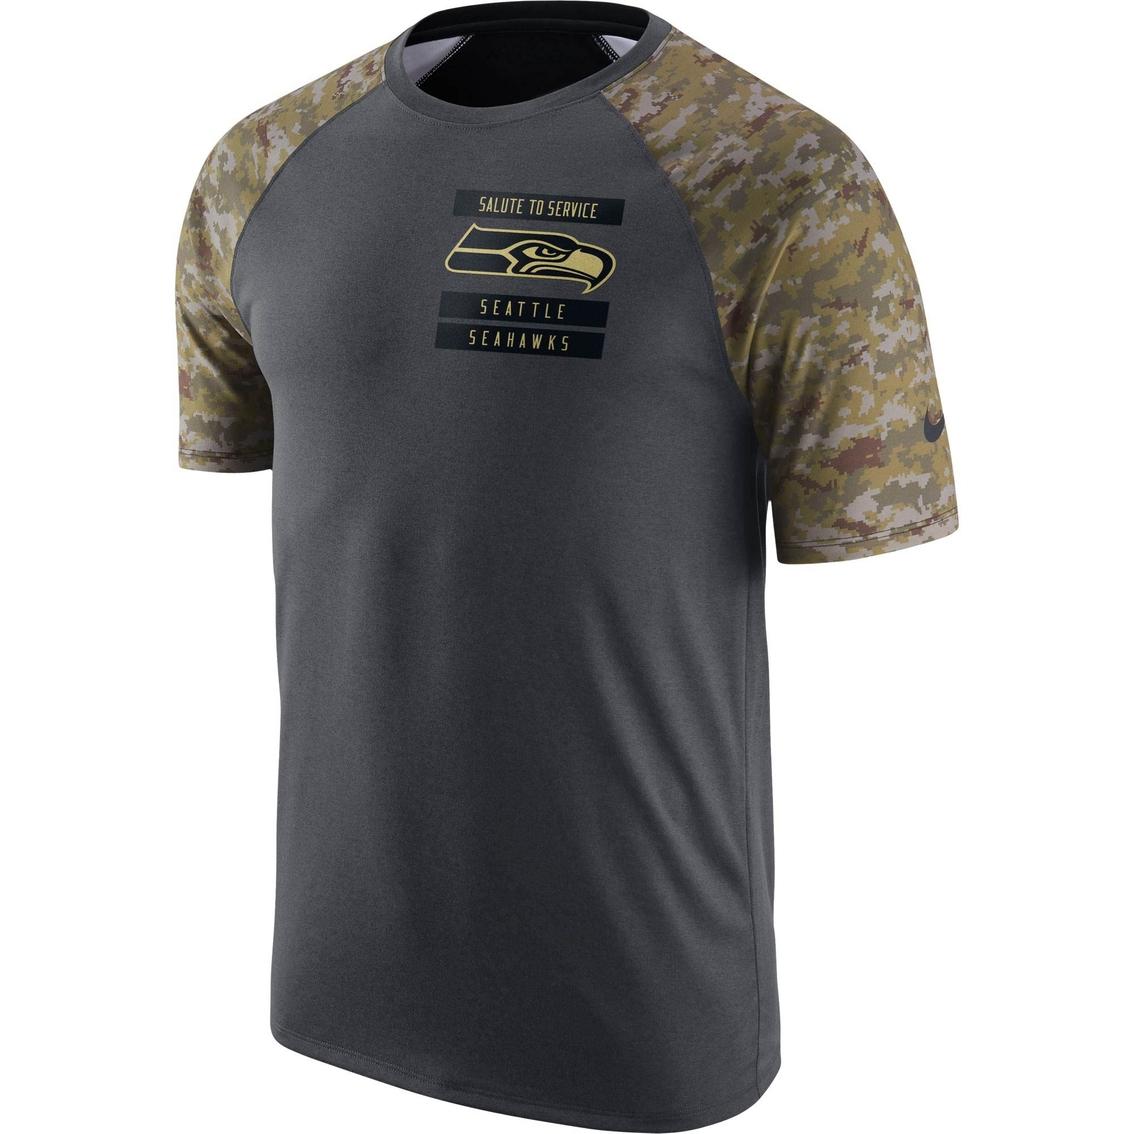 big sale 56c96 74fd8 Nike Nfl Seattle Seahawks Salute To Service Tee | Hoodies ...